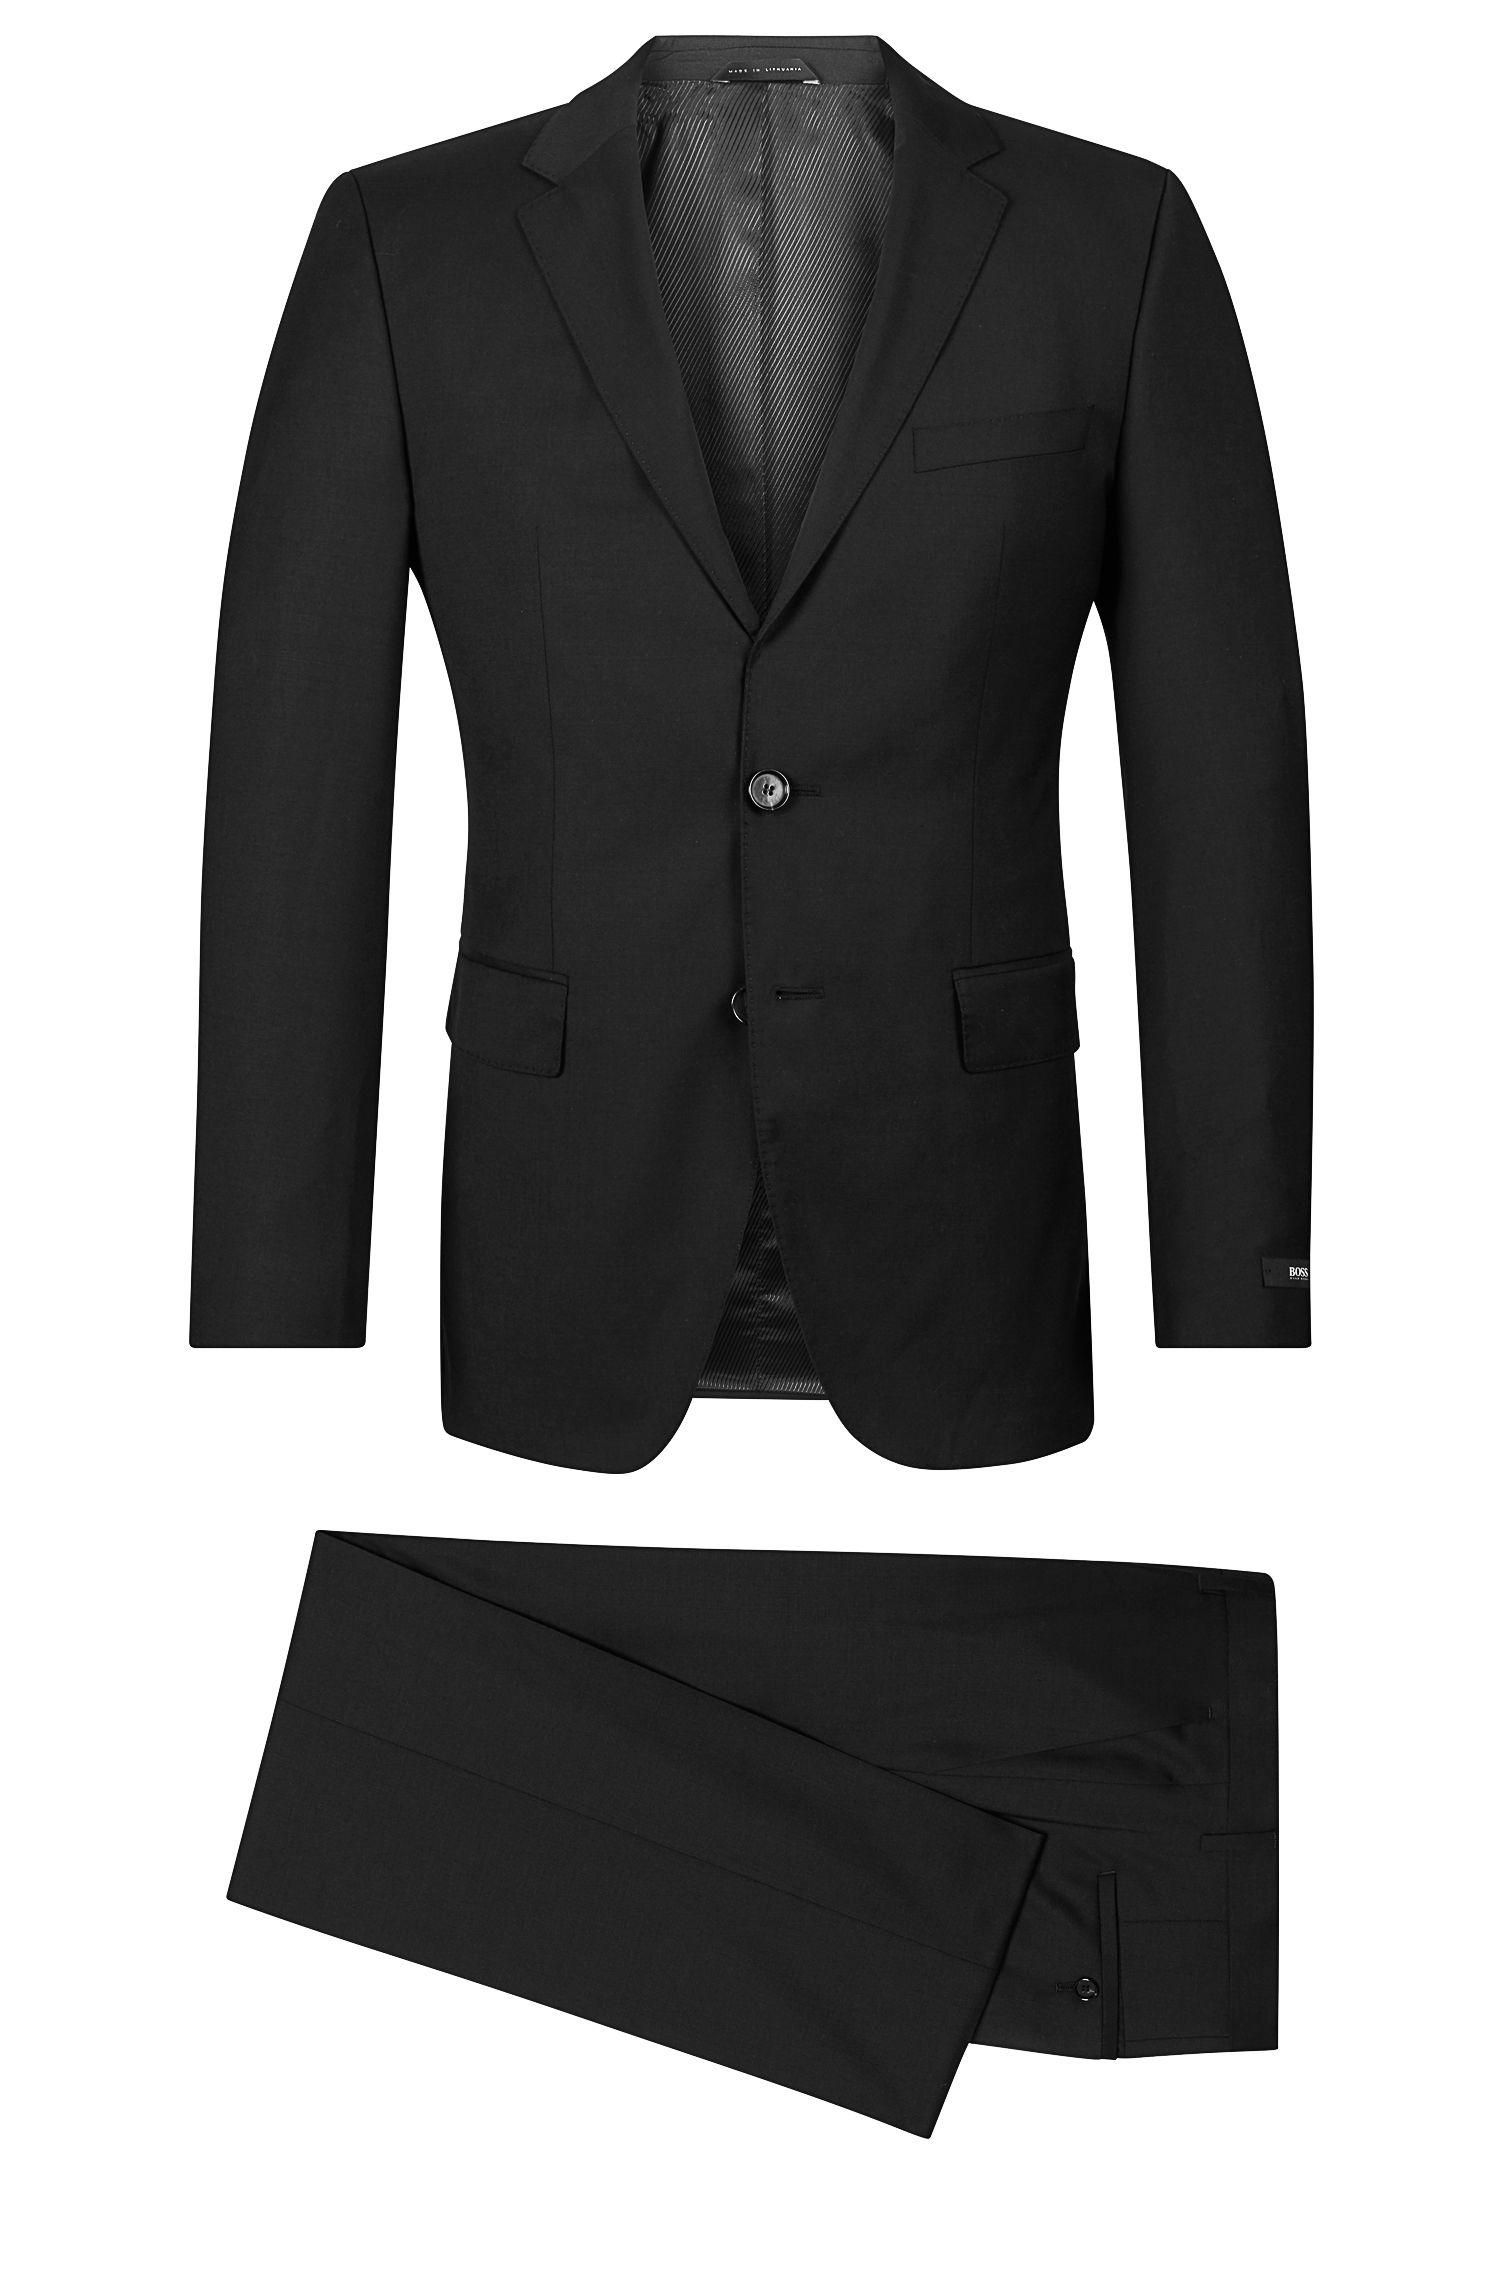 'The James/Sharp' | Regular Fit, Super 120 Italian Virgin Wool Suit